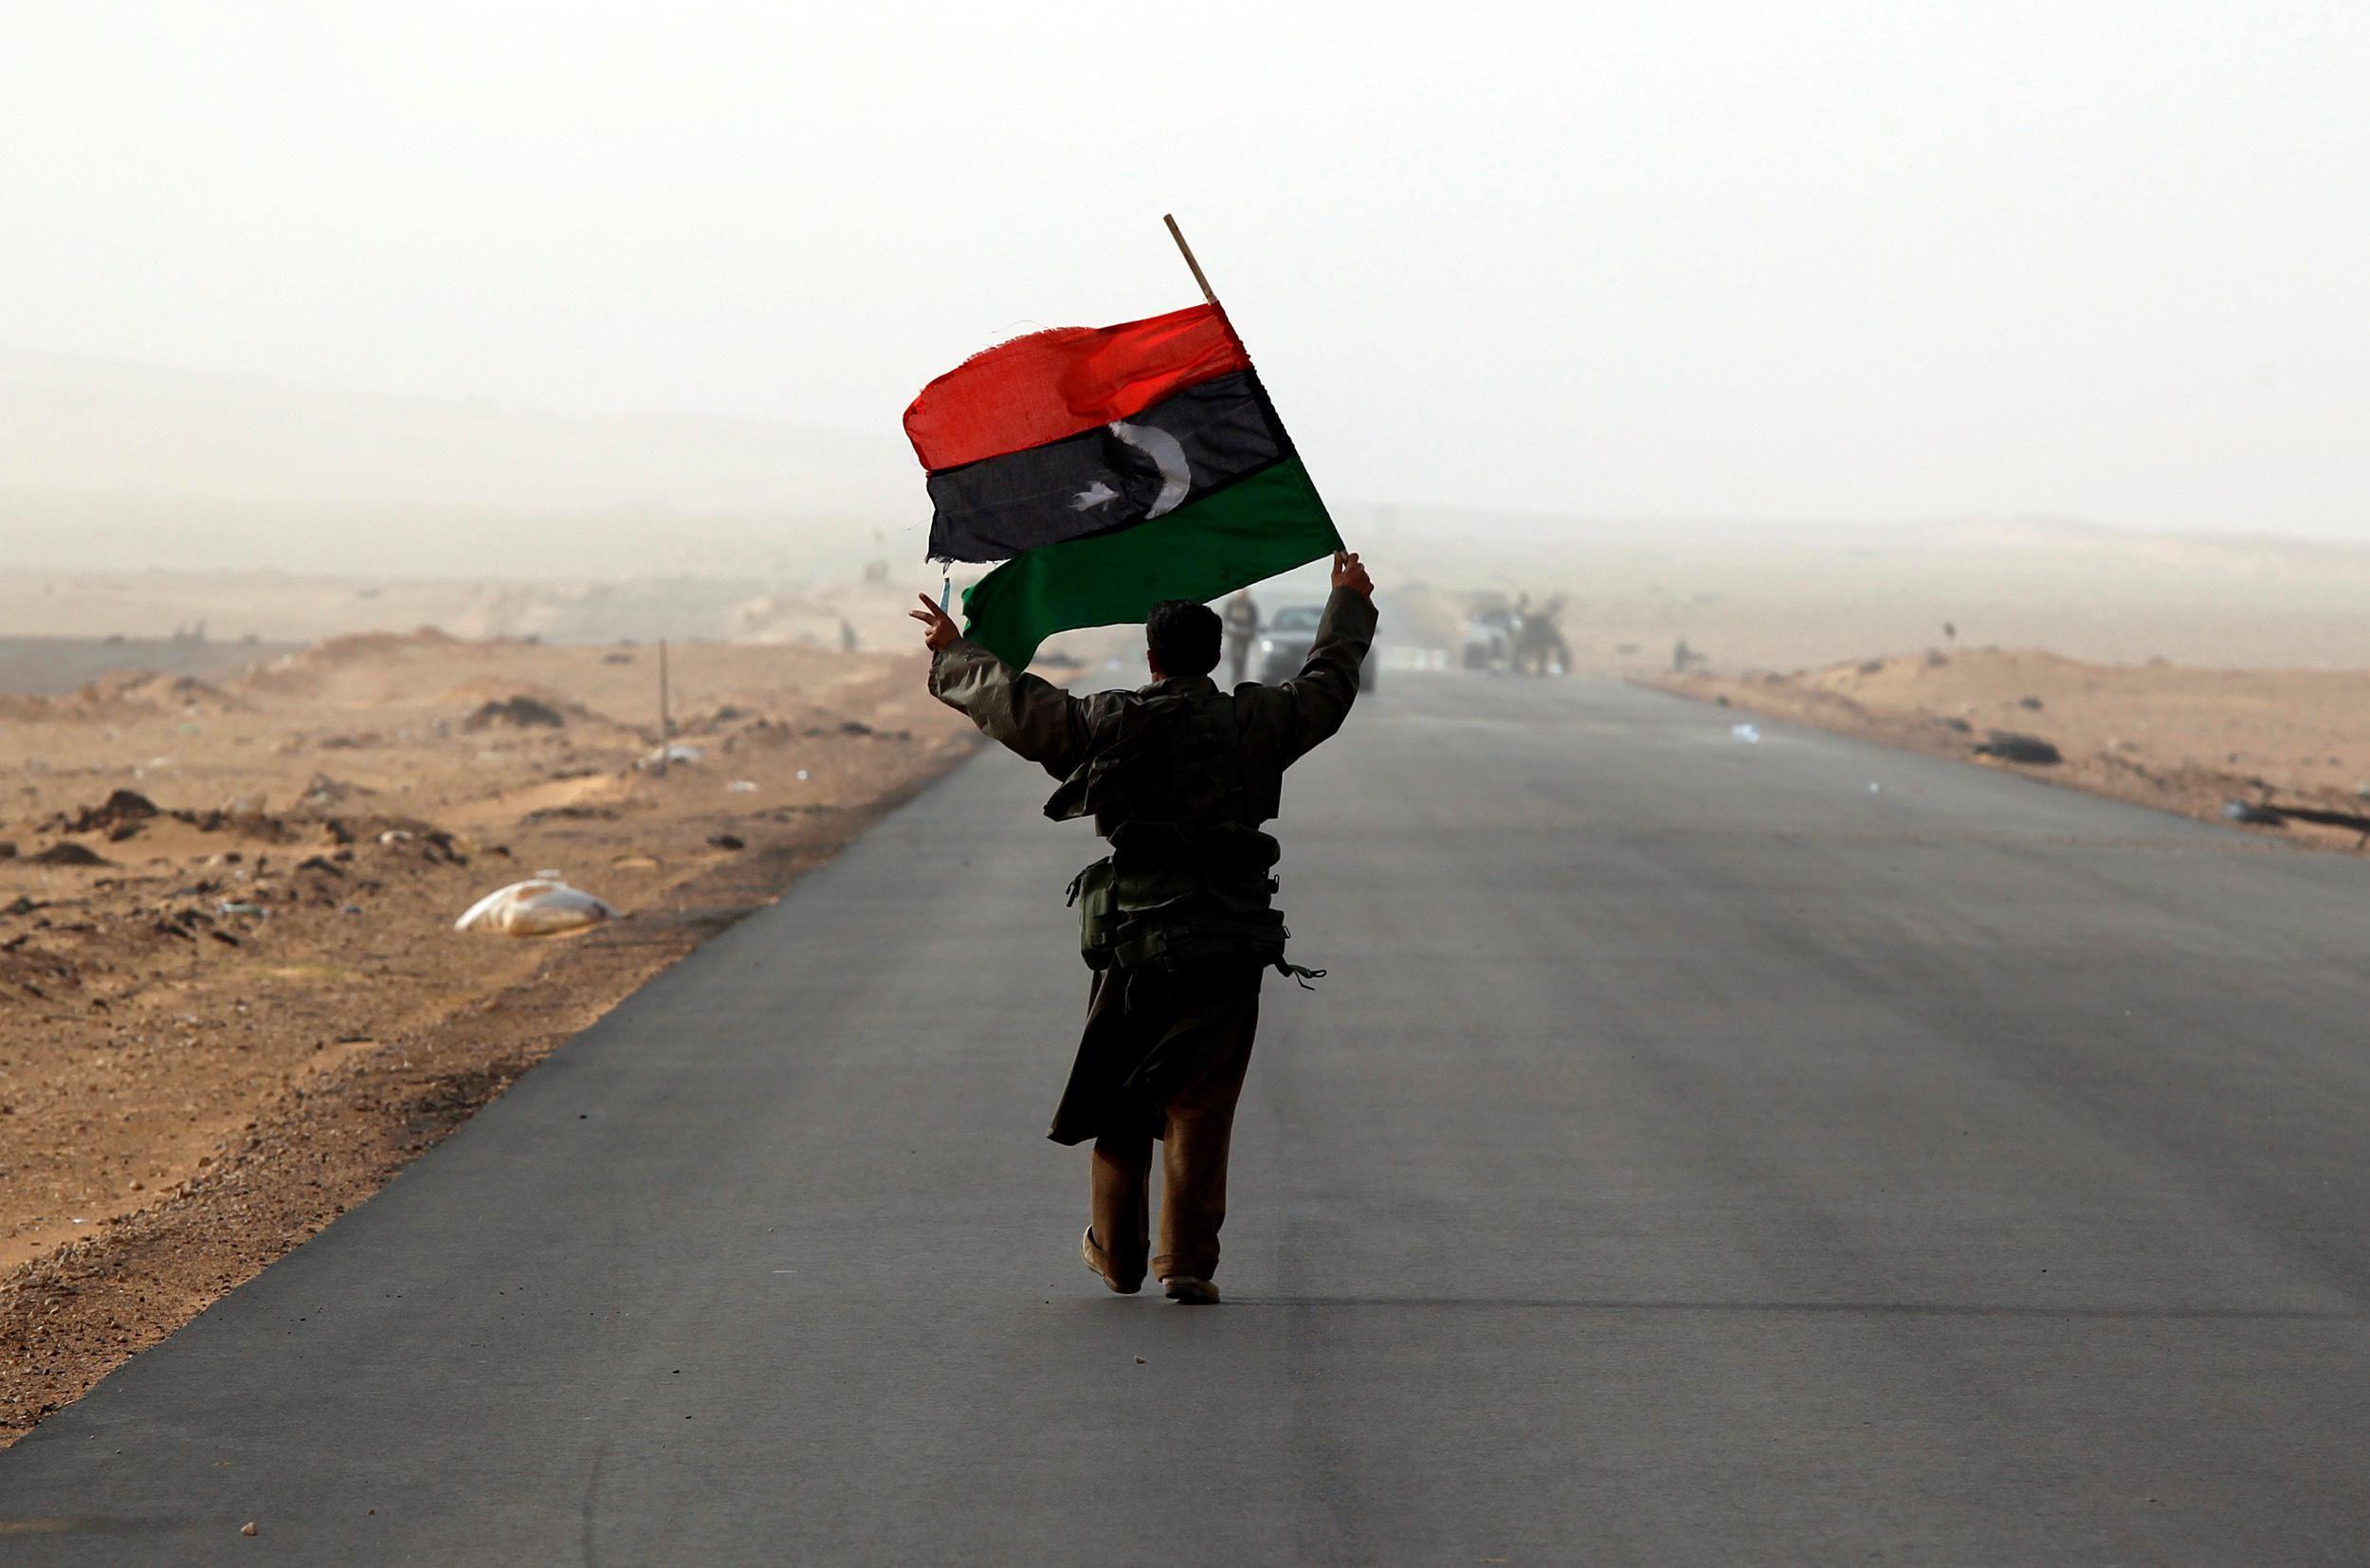 What We're Watching: Libya's future, Azeris and Iranians bicker, Shakira fights wild boars